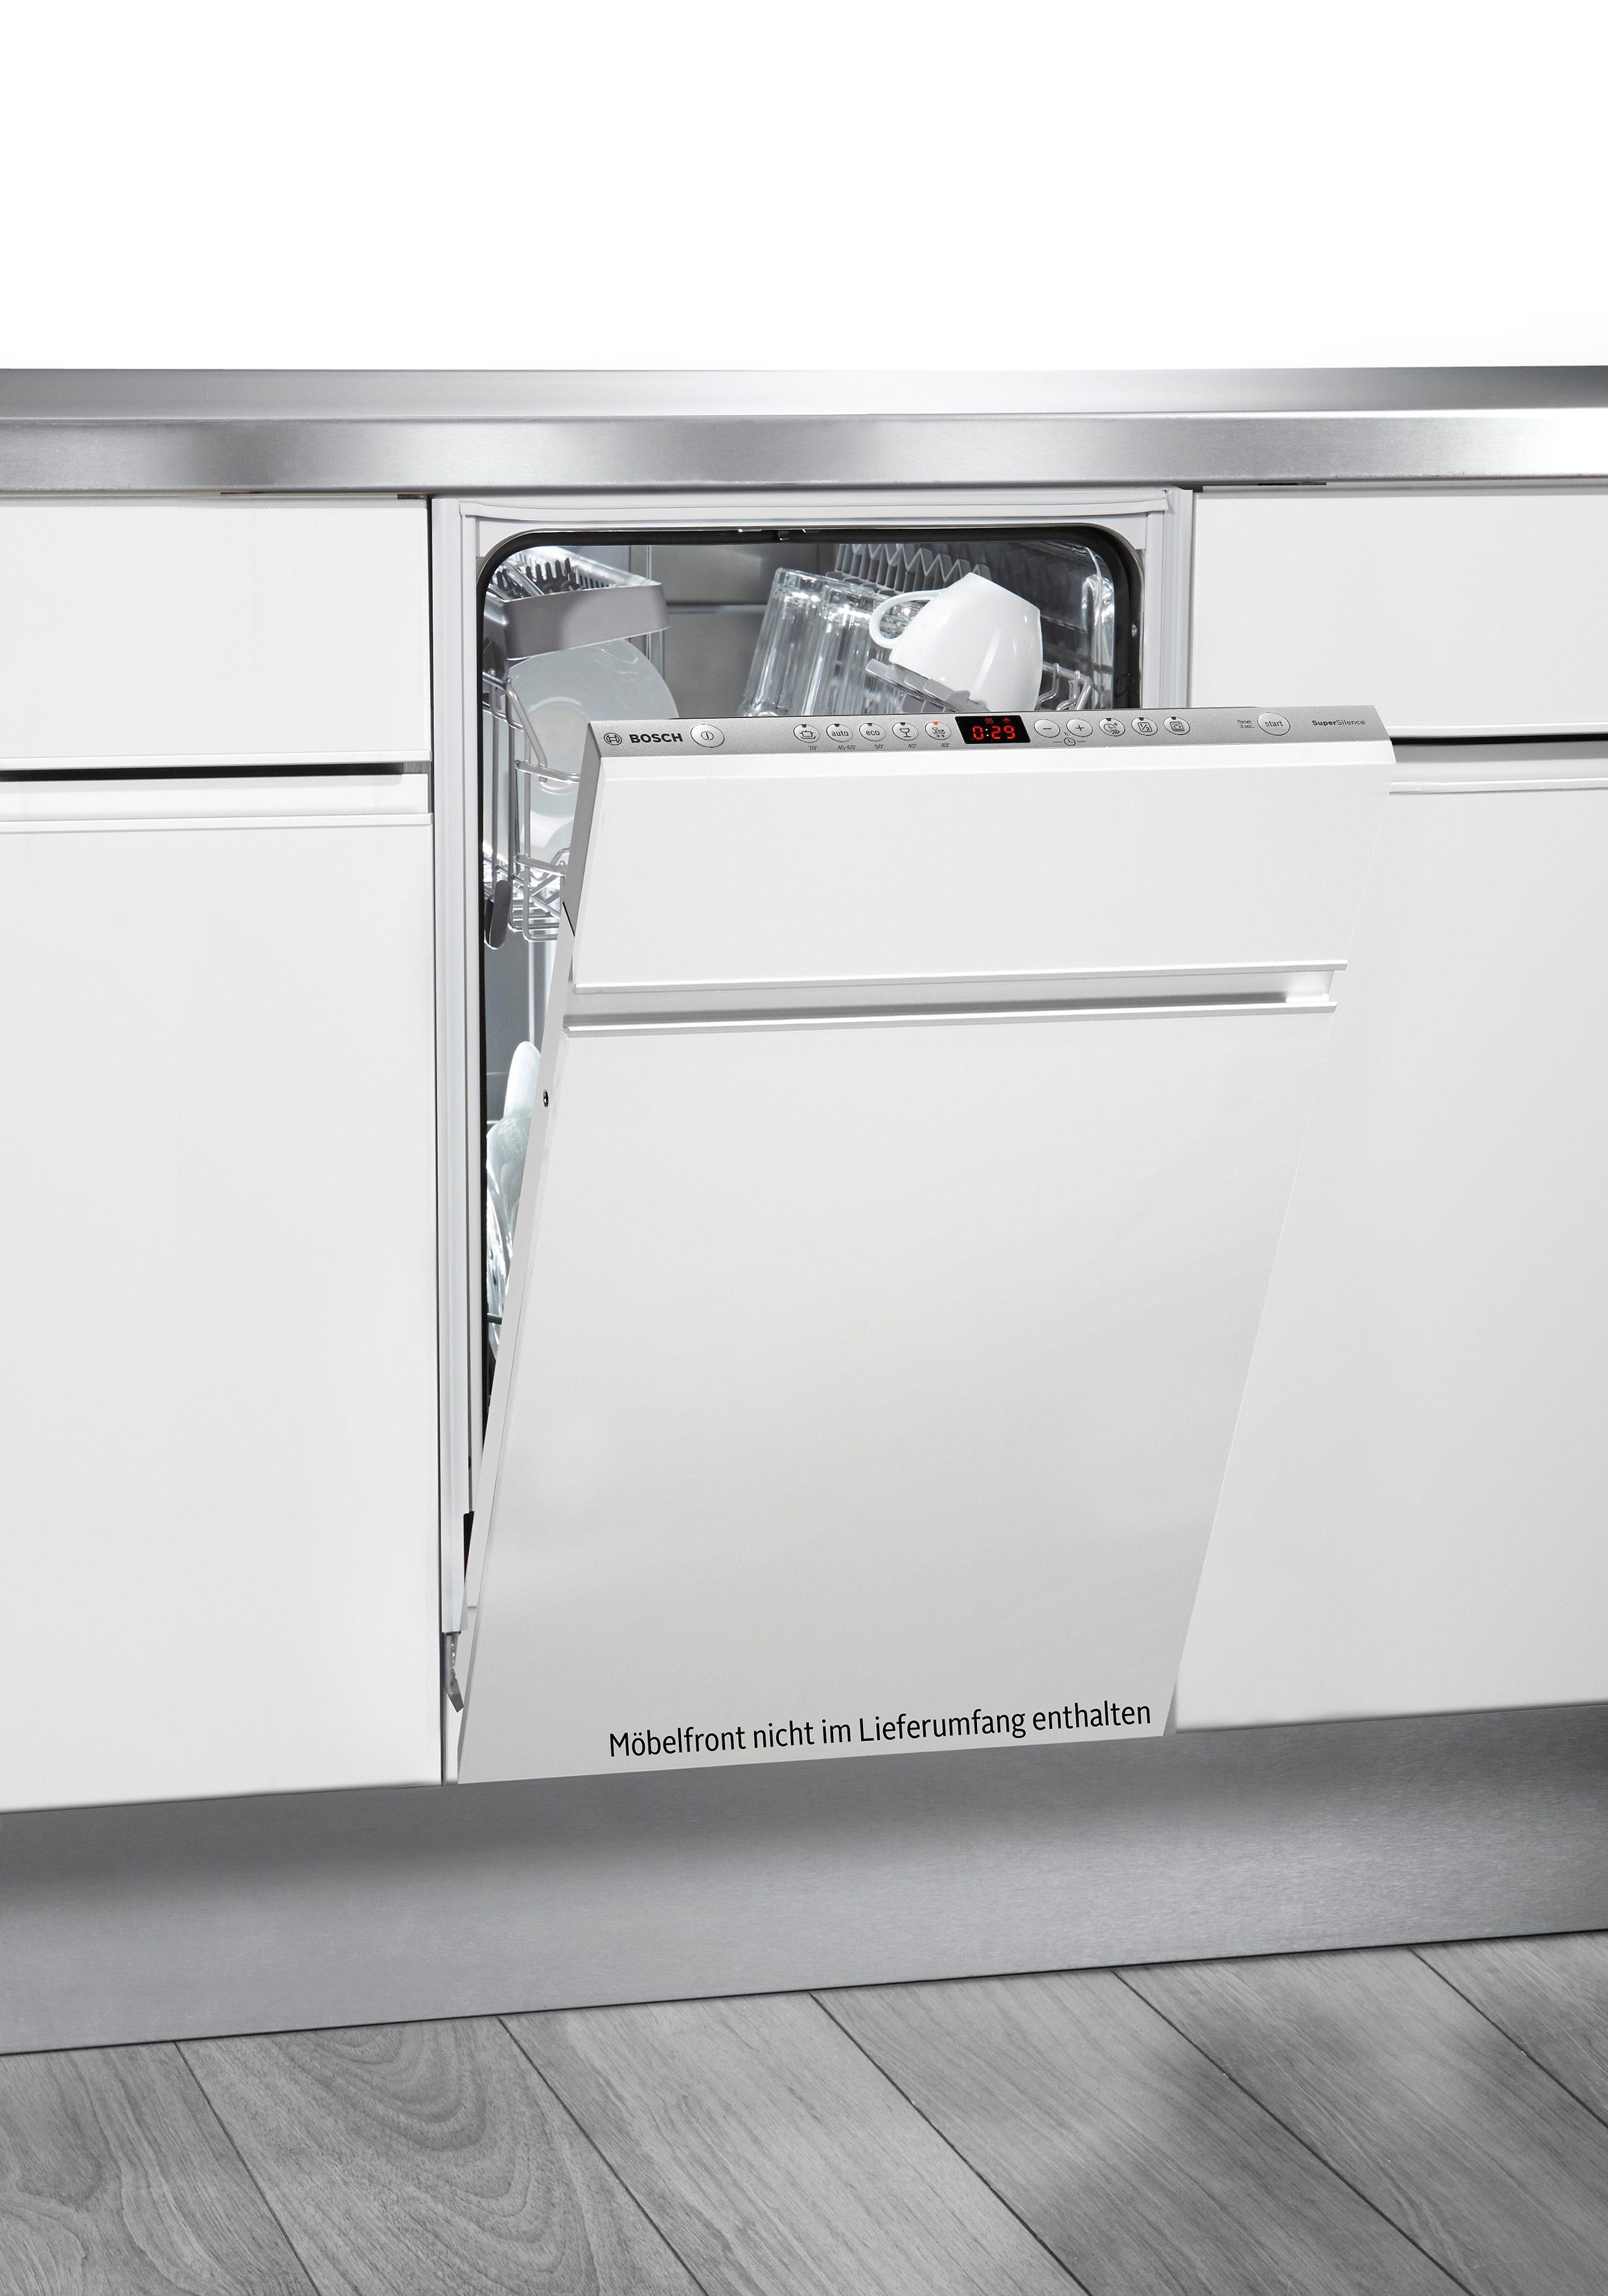 Bosch vollintegrierbarer Einbaugeschirrspüler SPV53N00EU, Energieklasse A+, 9 Maßgedecke